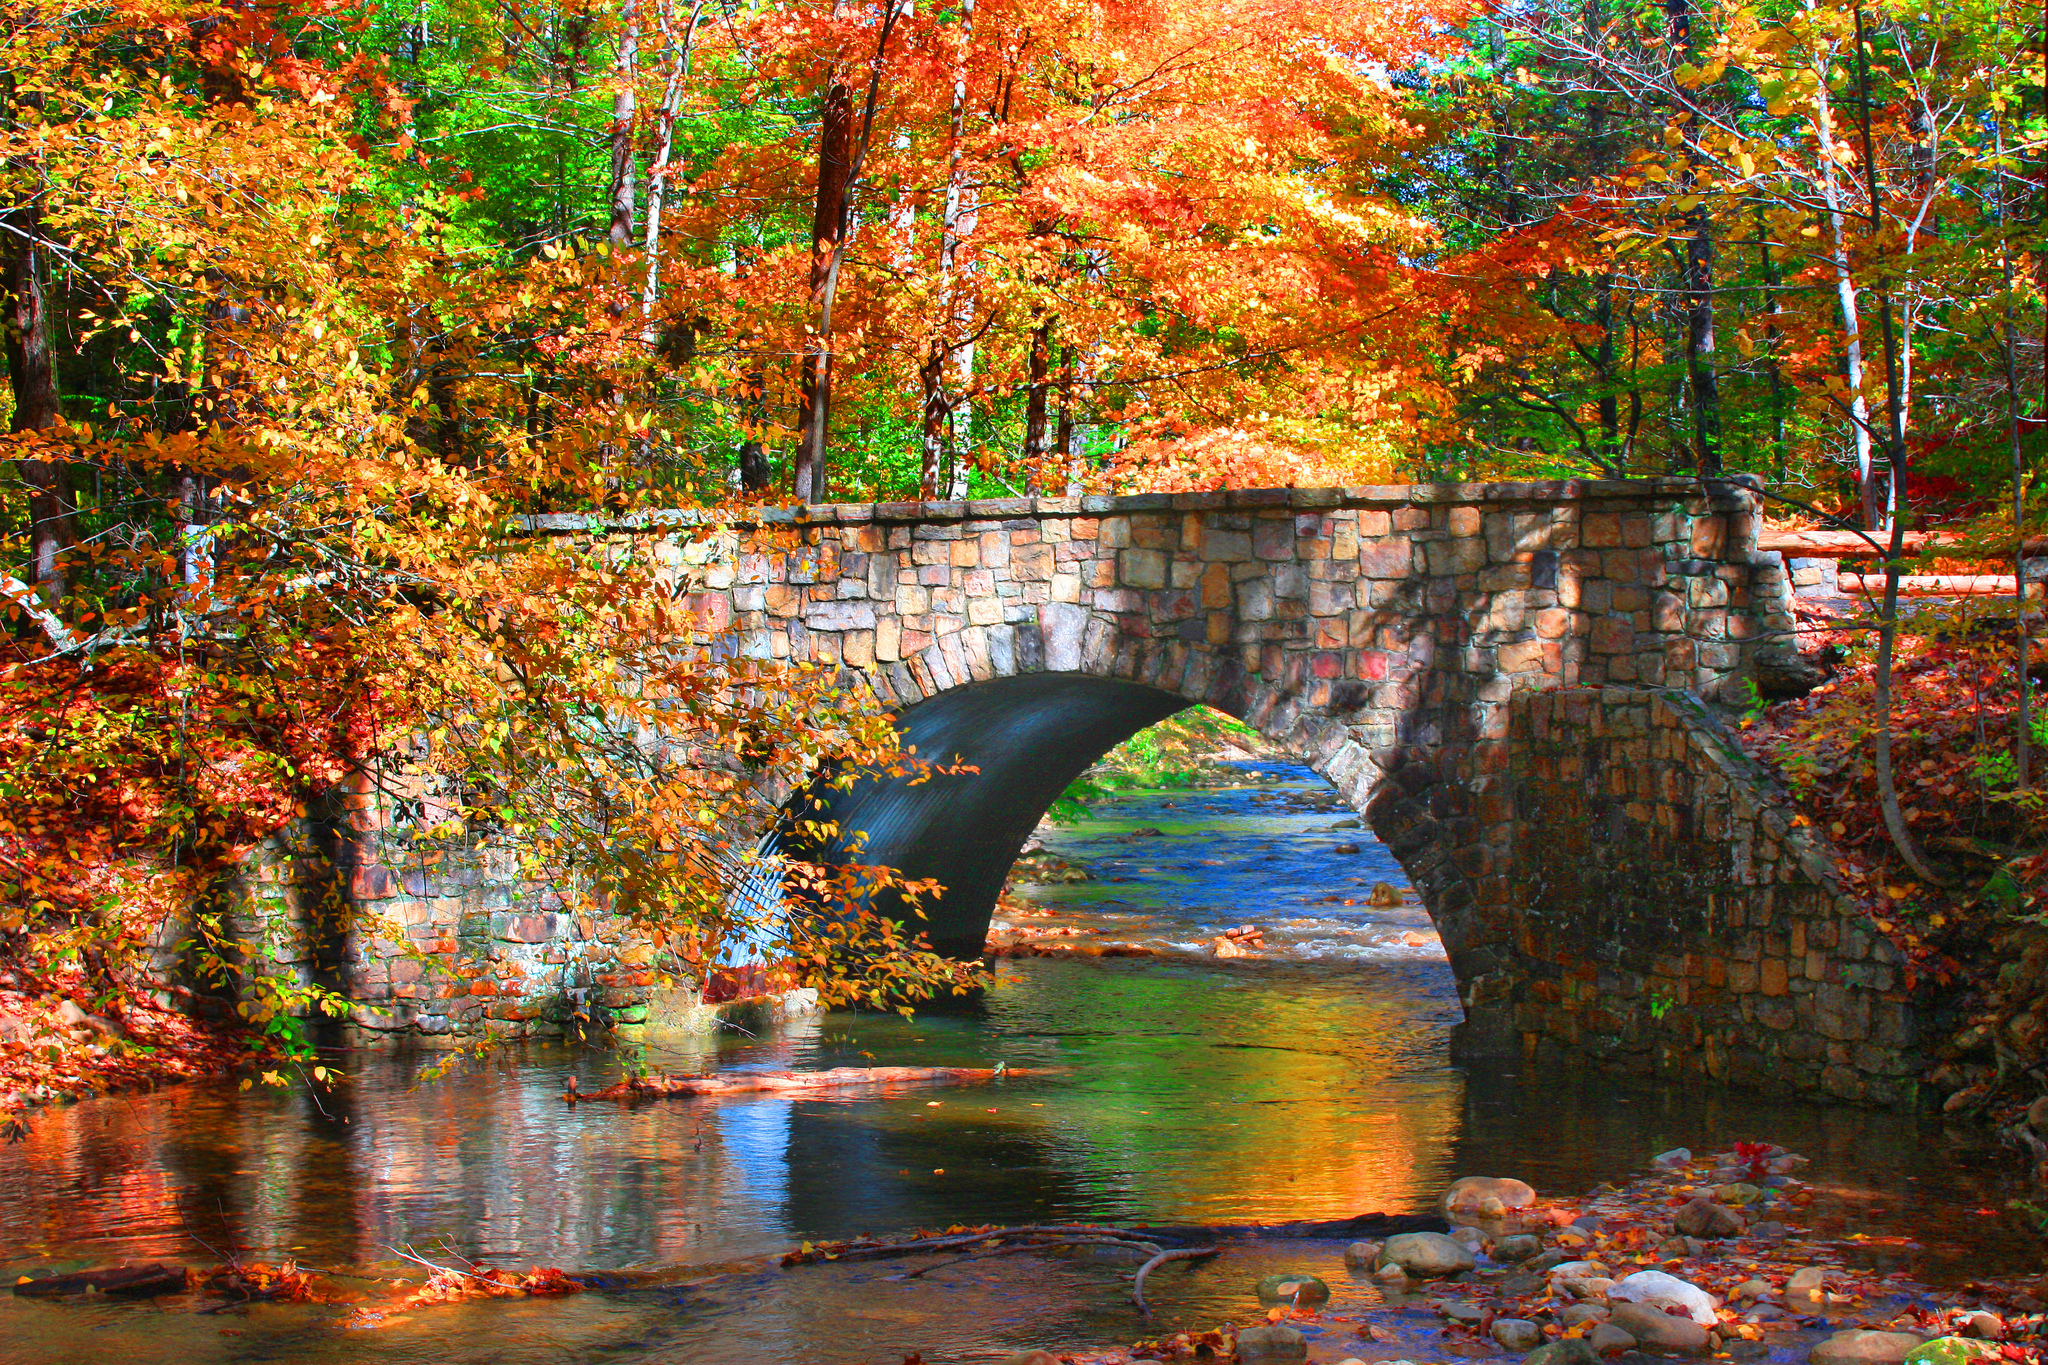 How To Get To Natural Bridge Va